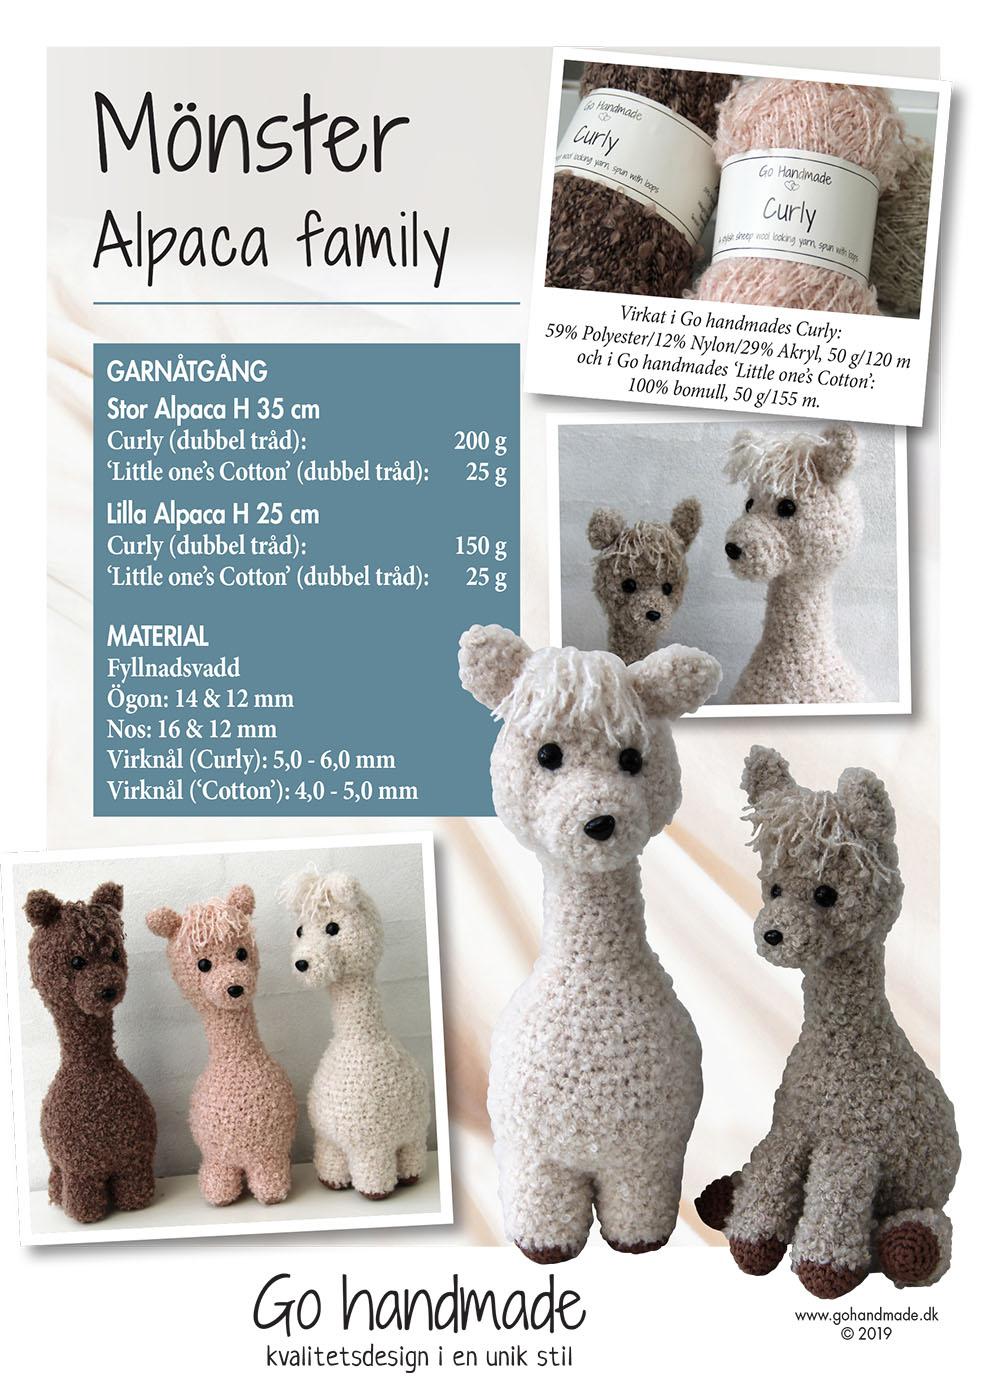 Awesome Alpaca Crochet Pattern [ FREE Amigurumi Pattern+Tutorials]   1400x987